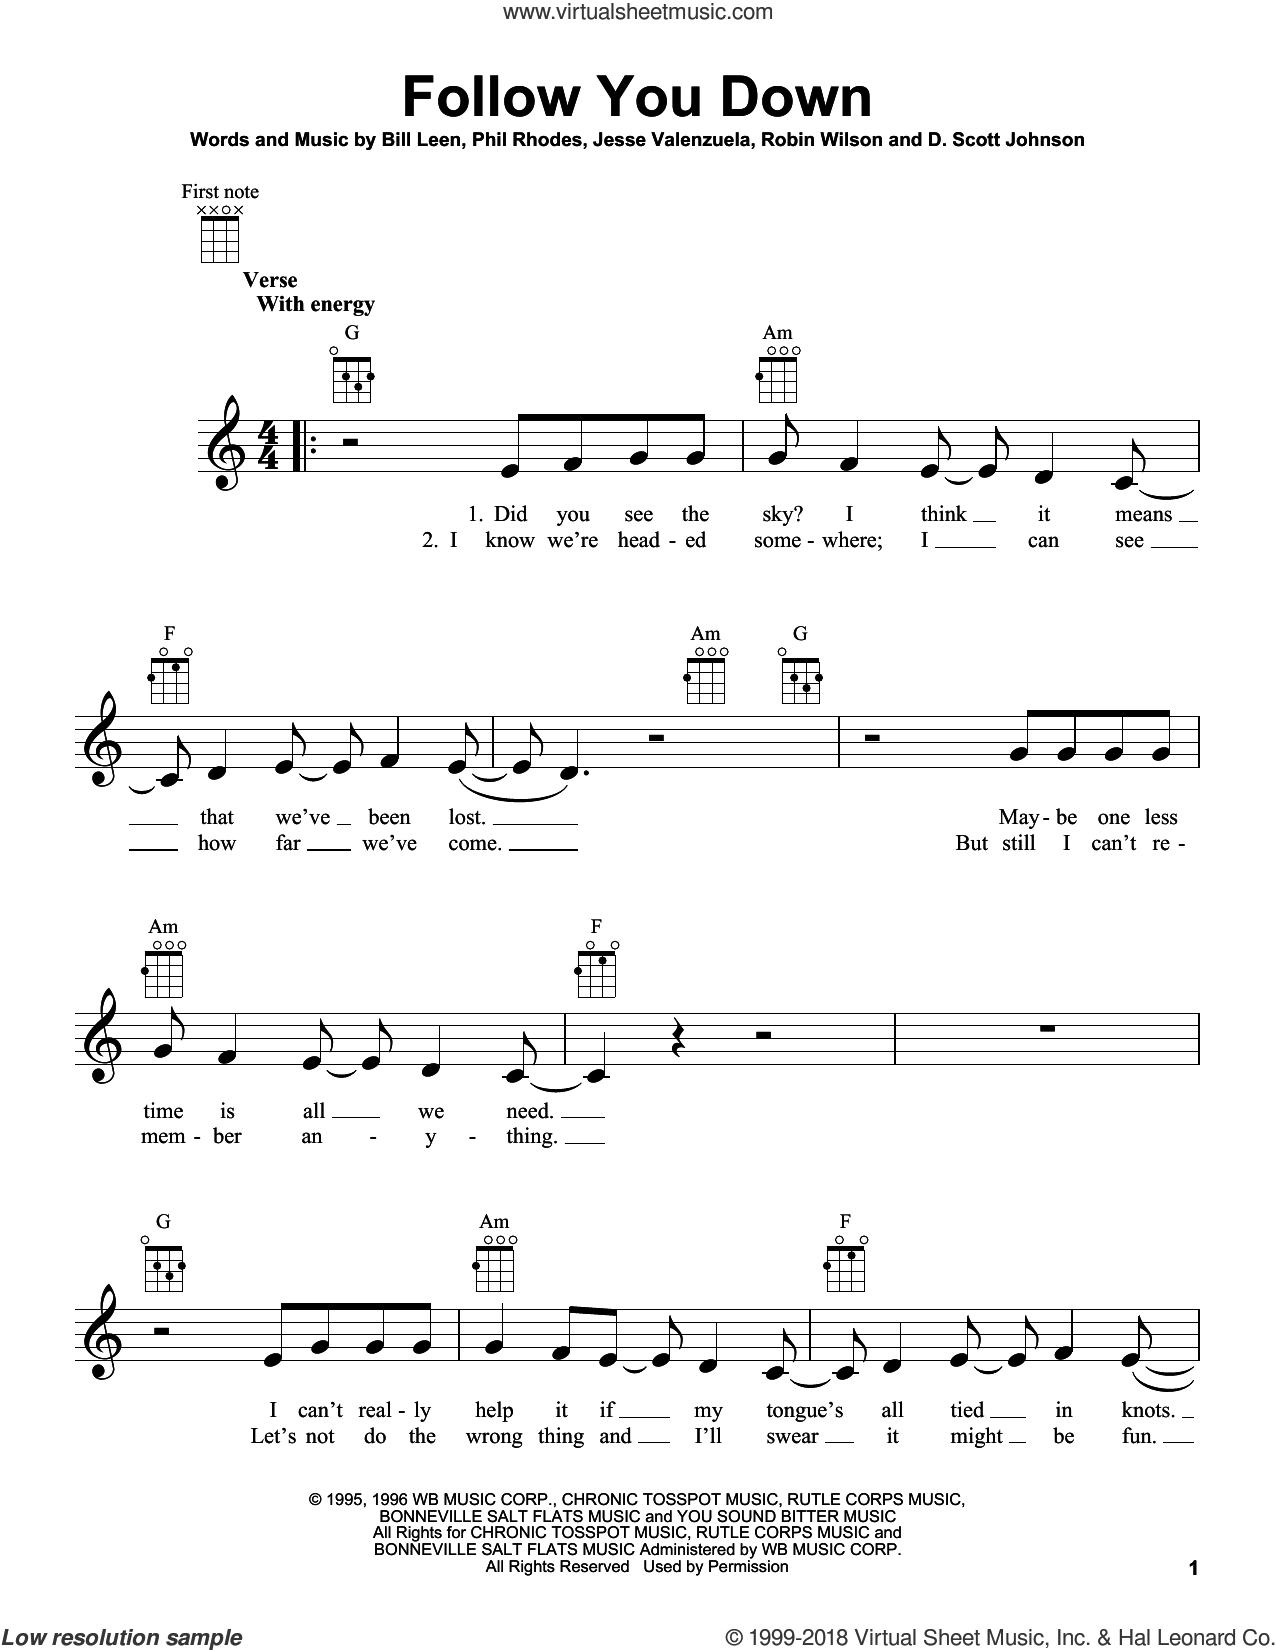 Follow You Down sheet music for ukulele by Gin Blossoms, Bill Leen, D. Scott Johnson, Jesse Valenzuela, Phil Rhodes and Robin Wilson, intermediate skill level